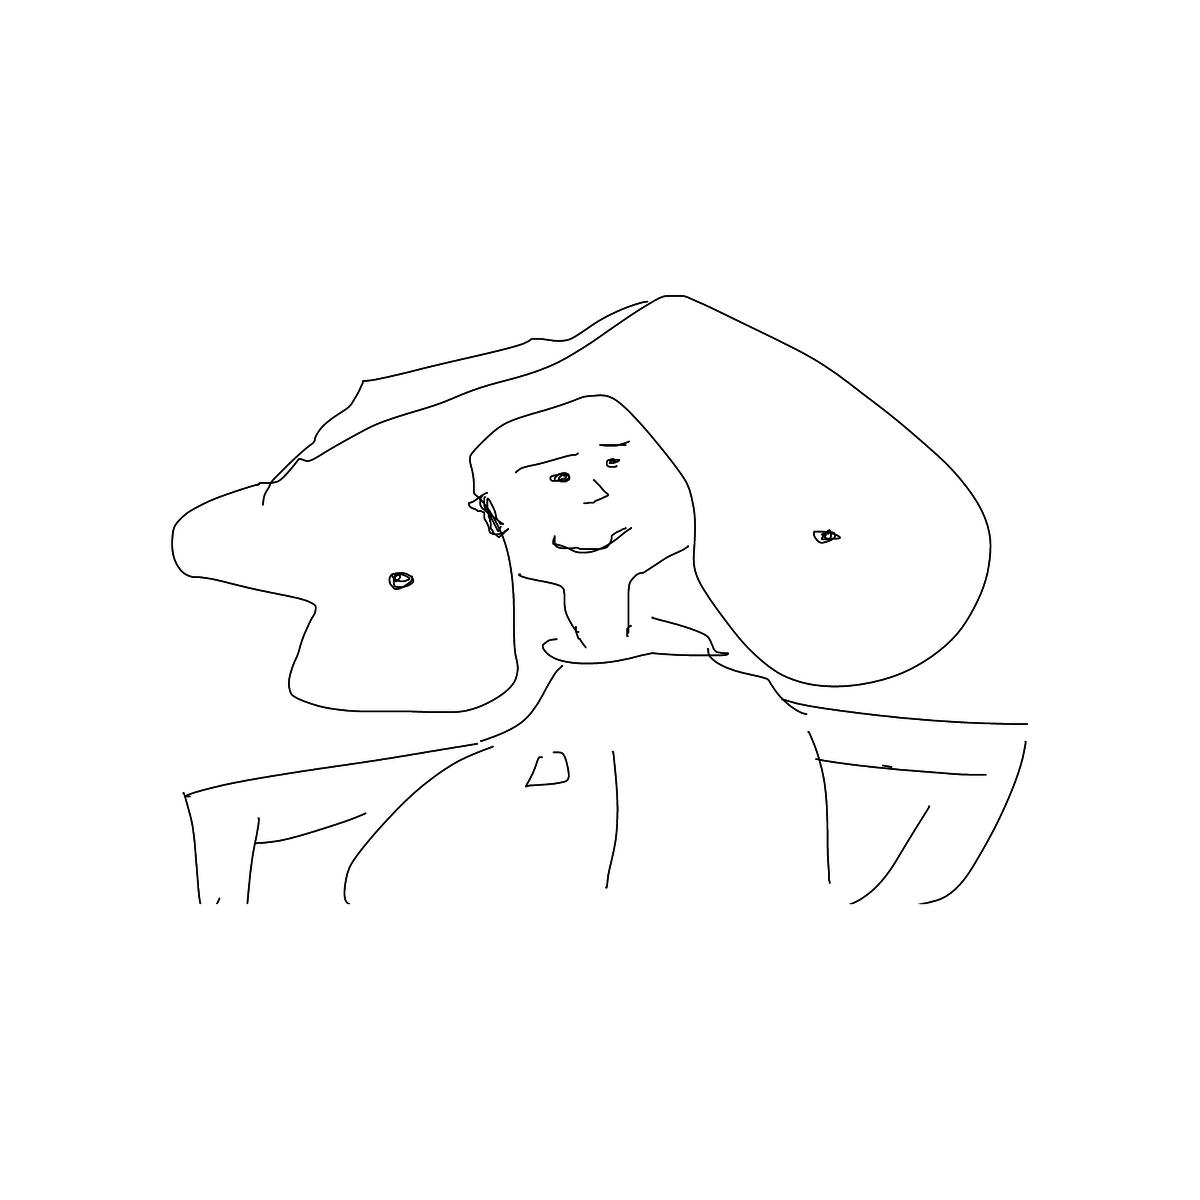 BAAAM drawing#7818 lat:51.0562210083007800lng: 3.7283549308776855